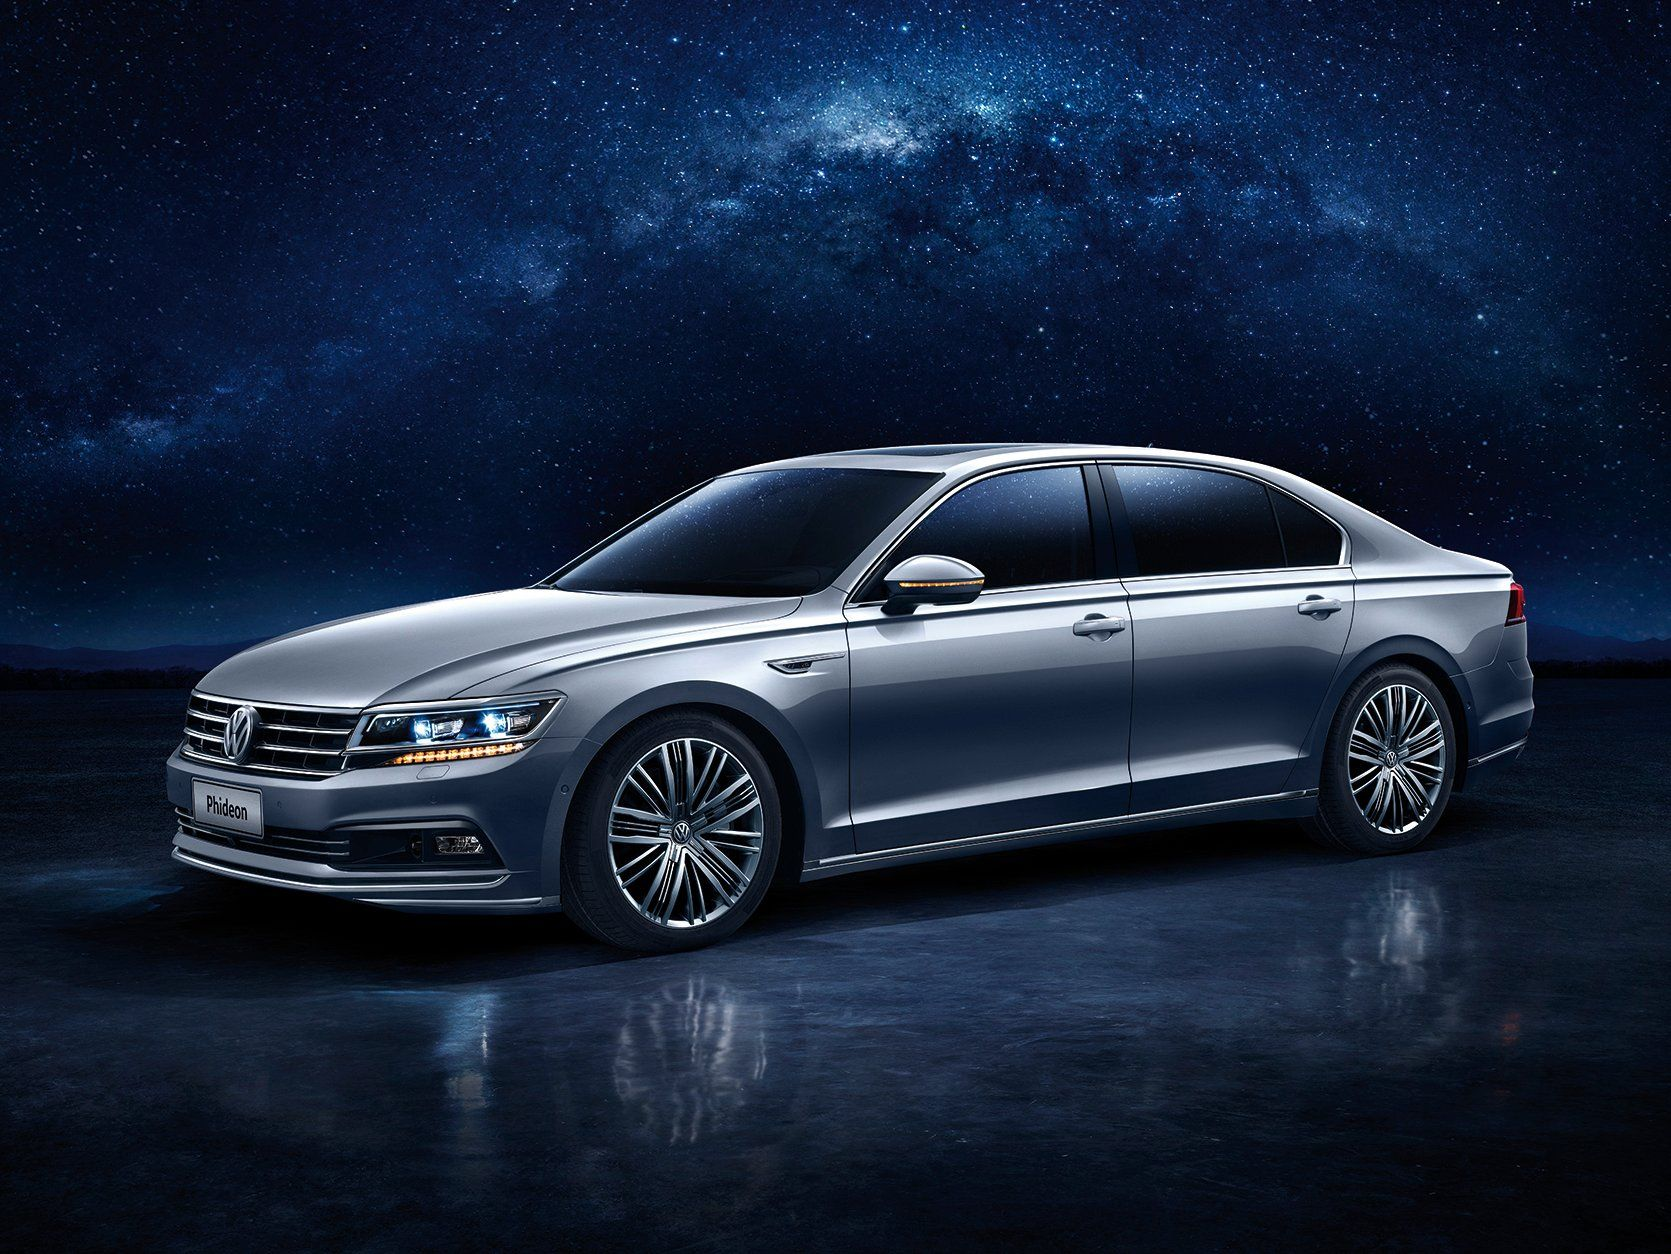 This Is The New Flagship Vw Luxury Sedan But You Can T Have One Volkswagen Phaeton Volkswagen Luxury Sedan